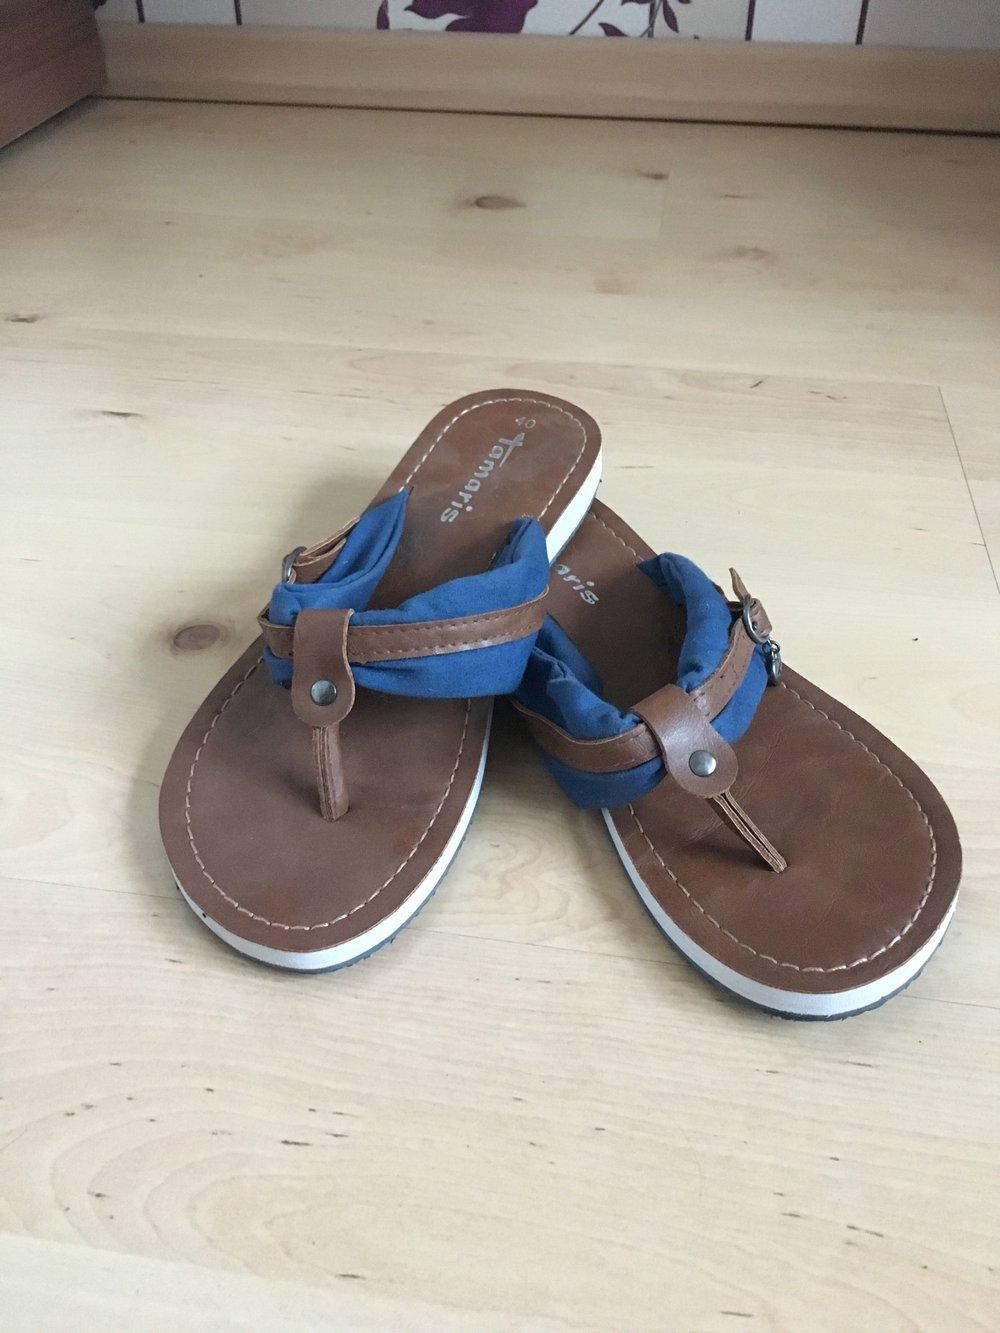 d2e5e11325774c Schuhe Neu Zehentrenner Tamaris Mit Braune Wie Details Blauen 608x8